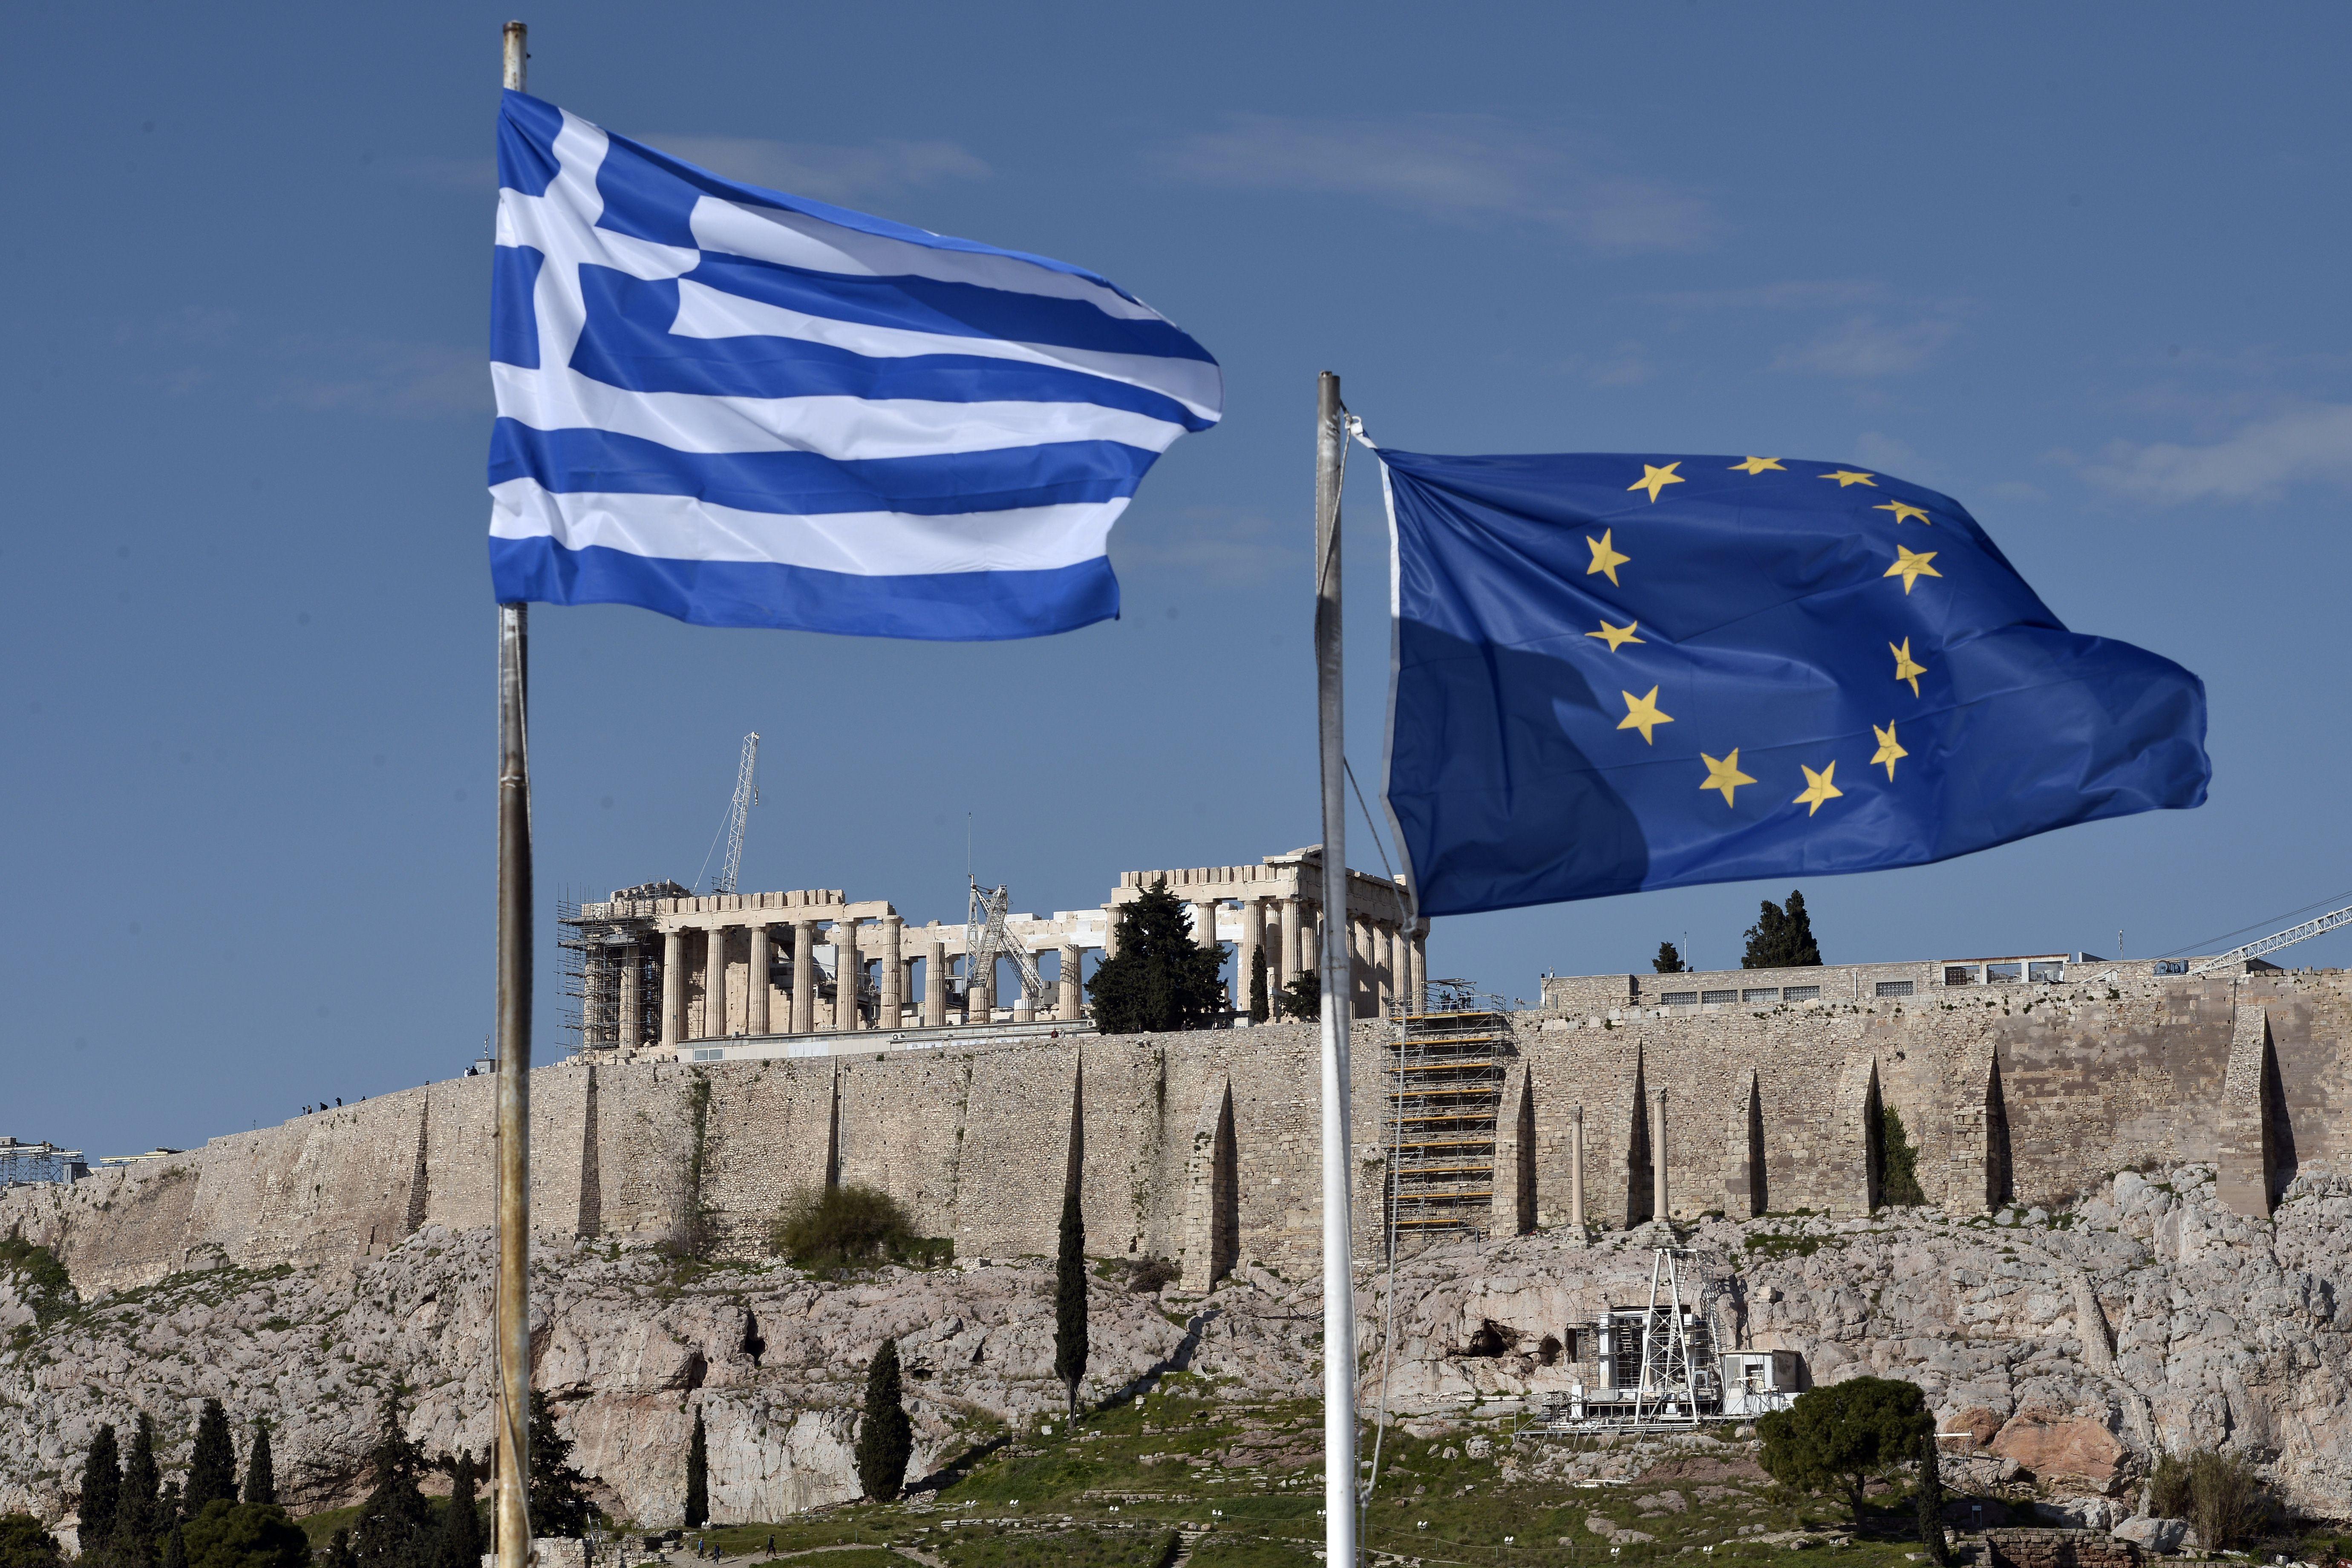 GREECE-FINANCE-ECONOMY-FLAGS